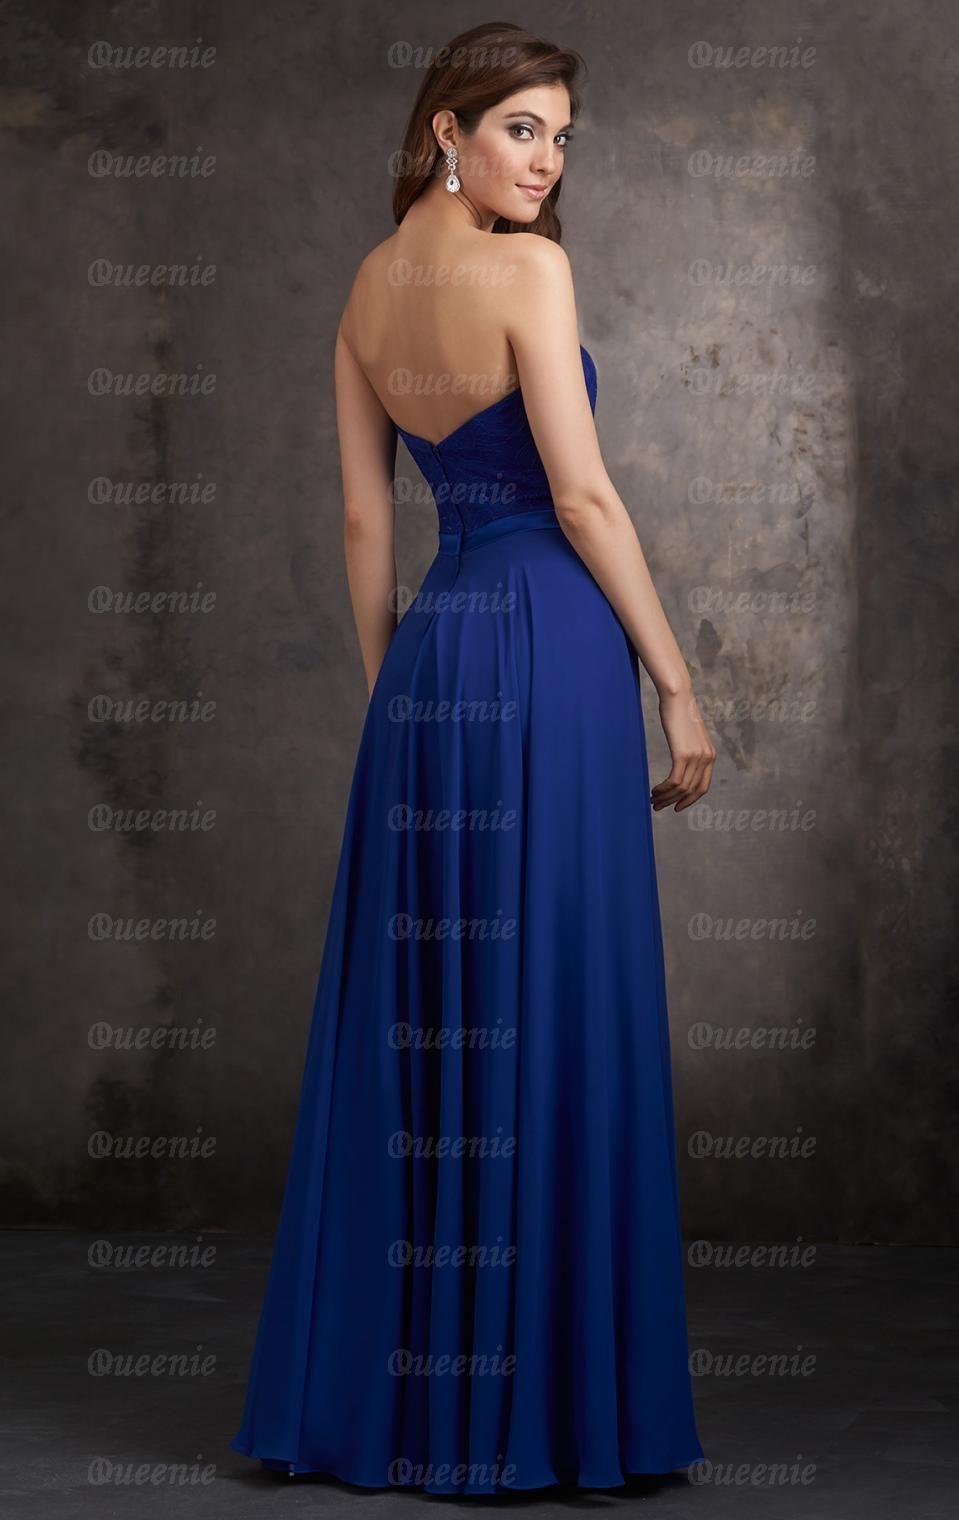 Elegant chiffon royal blue bridesmaid dress bnncc0019 bridesmaid uk elegant chiffon royal blue bridesmaid dress bnncc0019 bridesmaid uk ombrellifo Choice Image